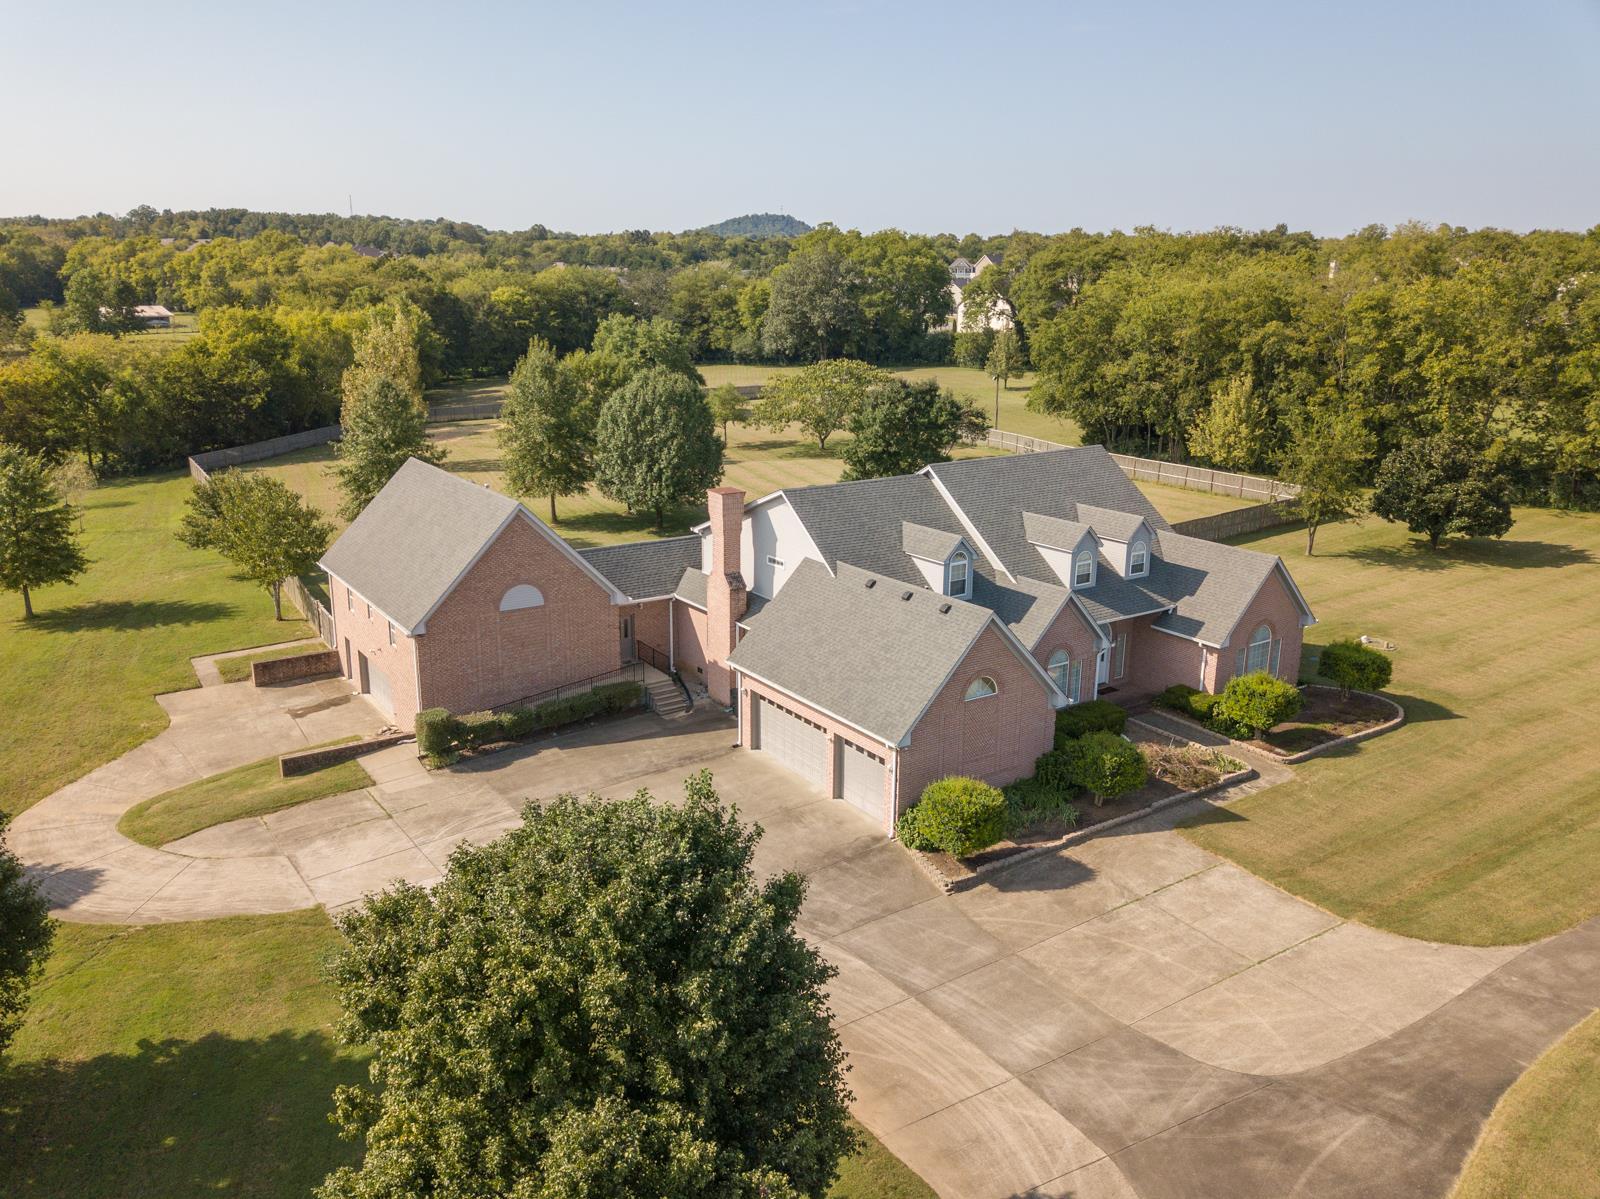 166 Saint Blaise Ct, Gallatin, TN 37066 - Gallatin, TN real estate listing